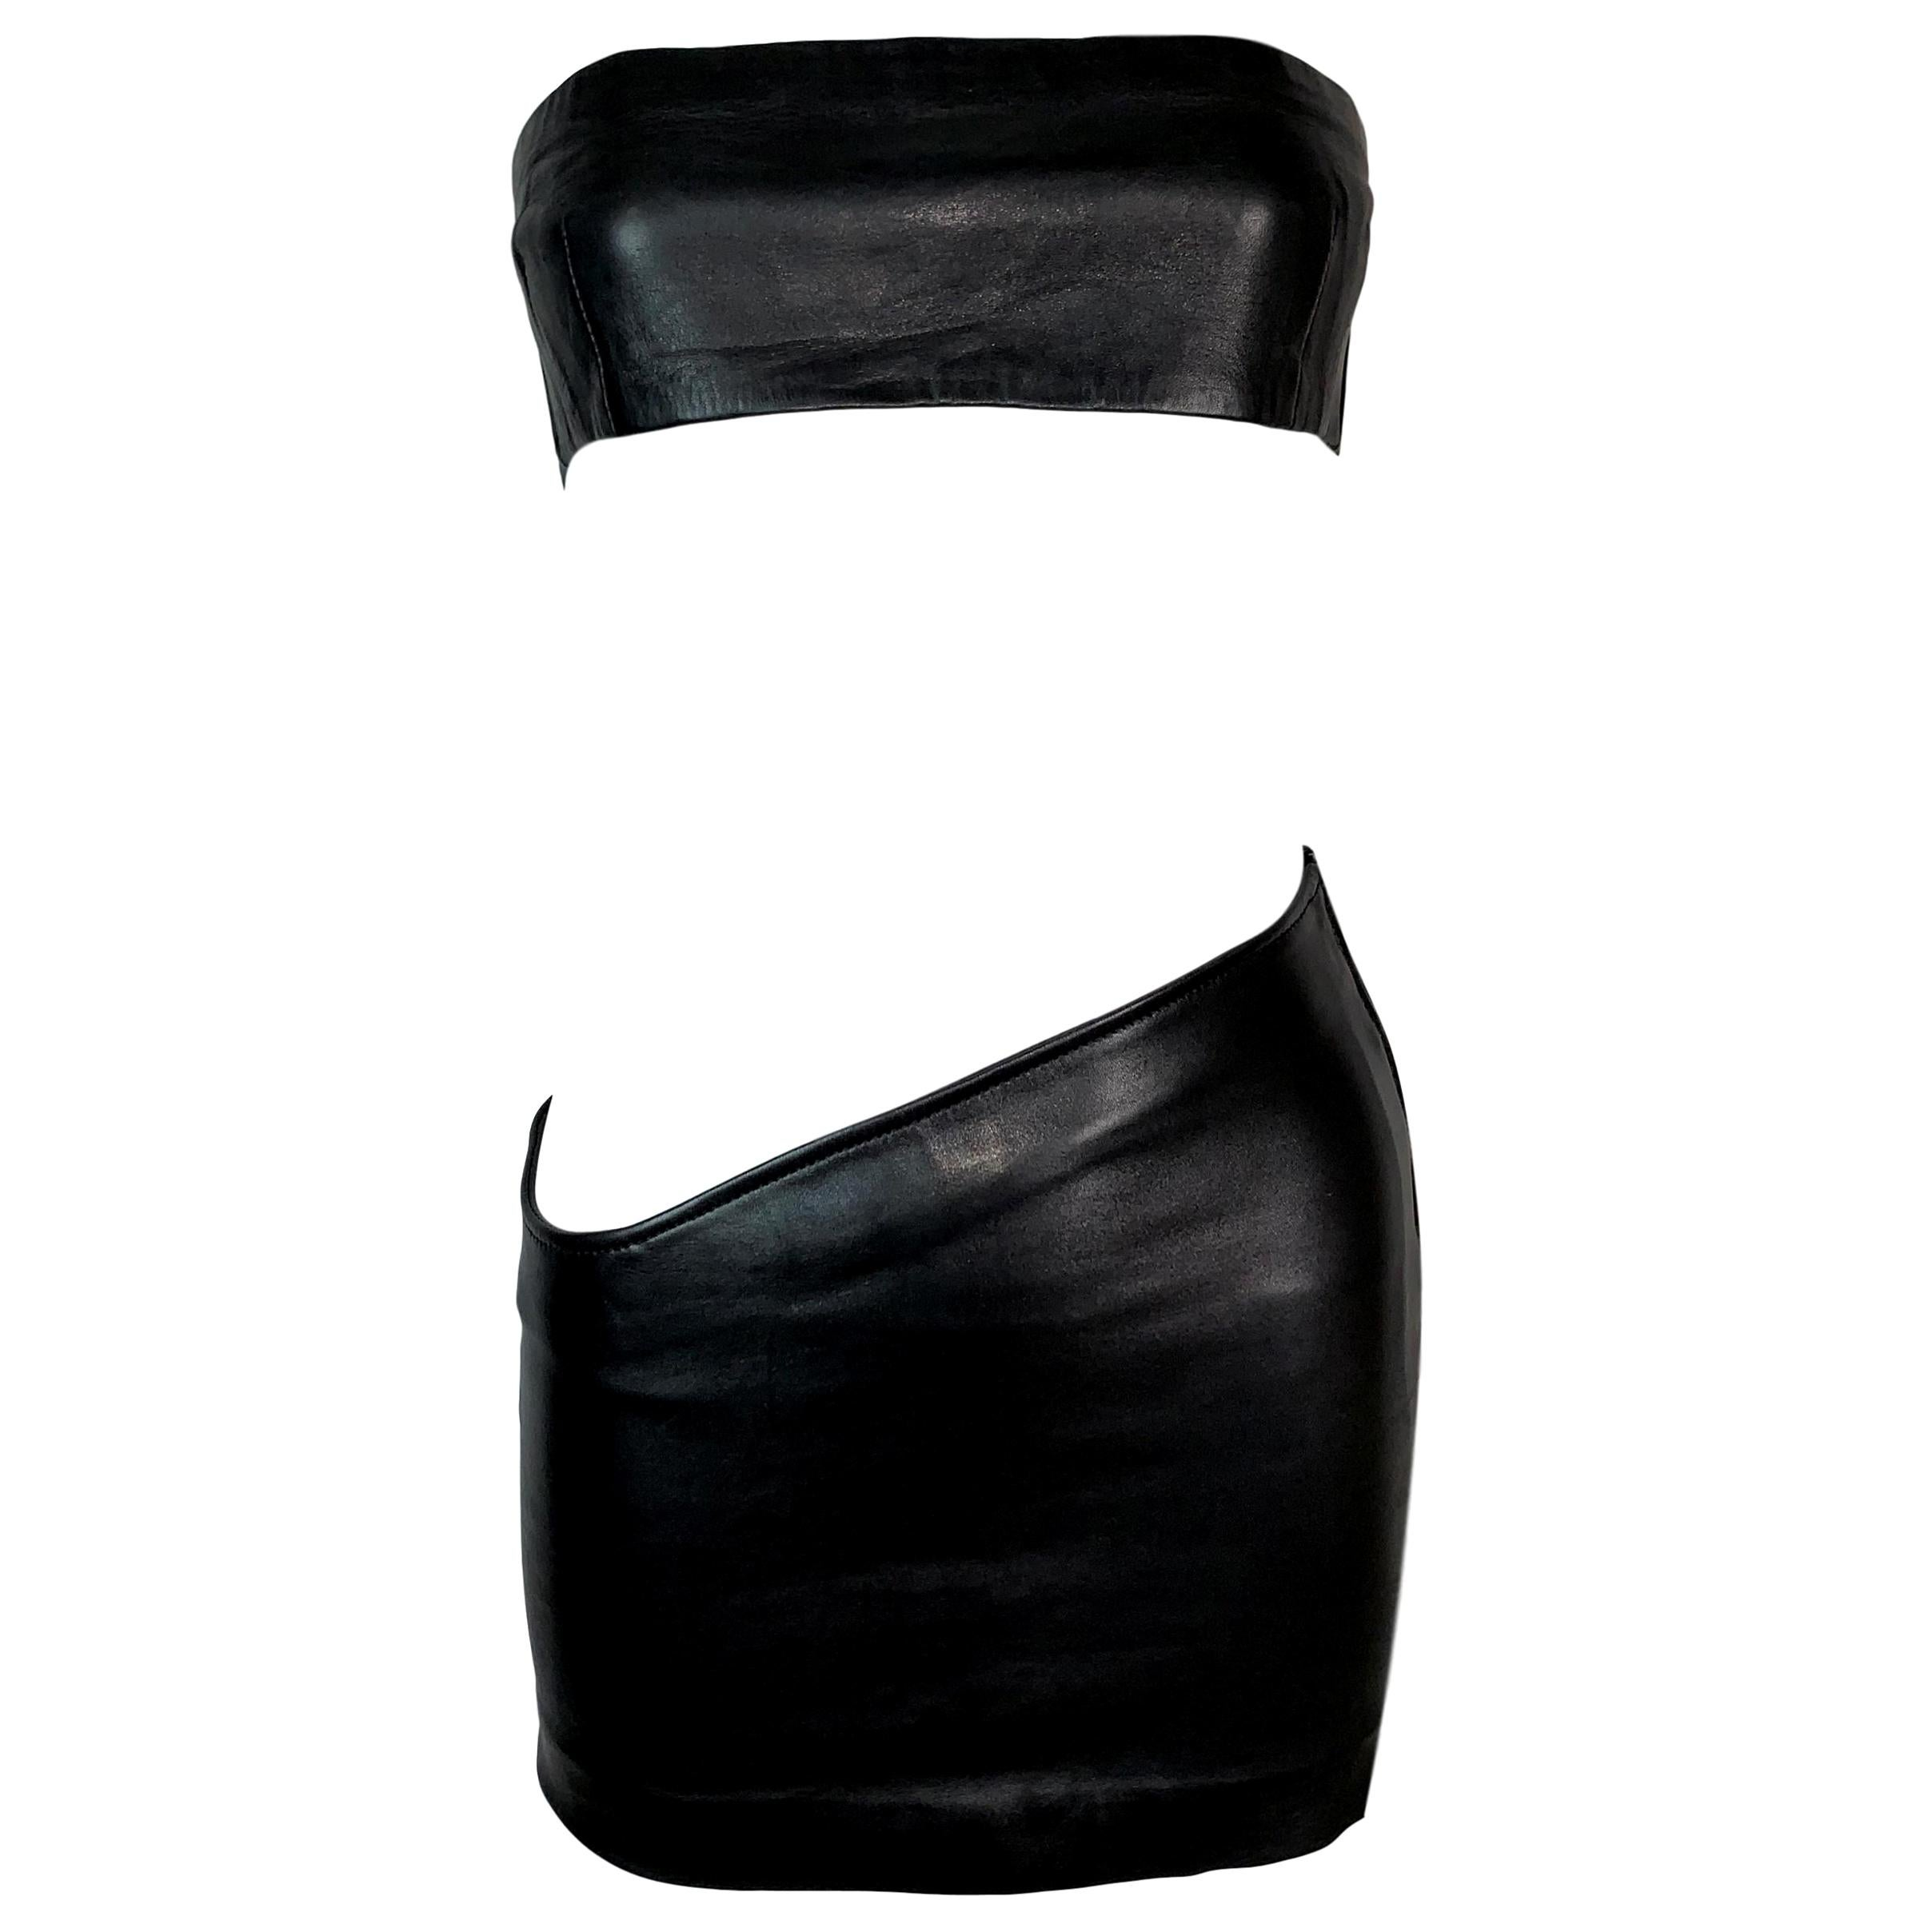 1998 Gucci by Tom Ford Black Leather Asymmetrical Mini Skirt & Tube Top Set